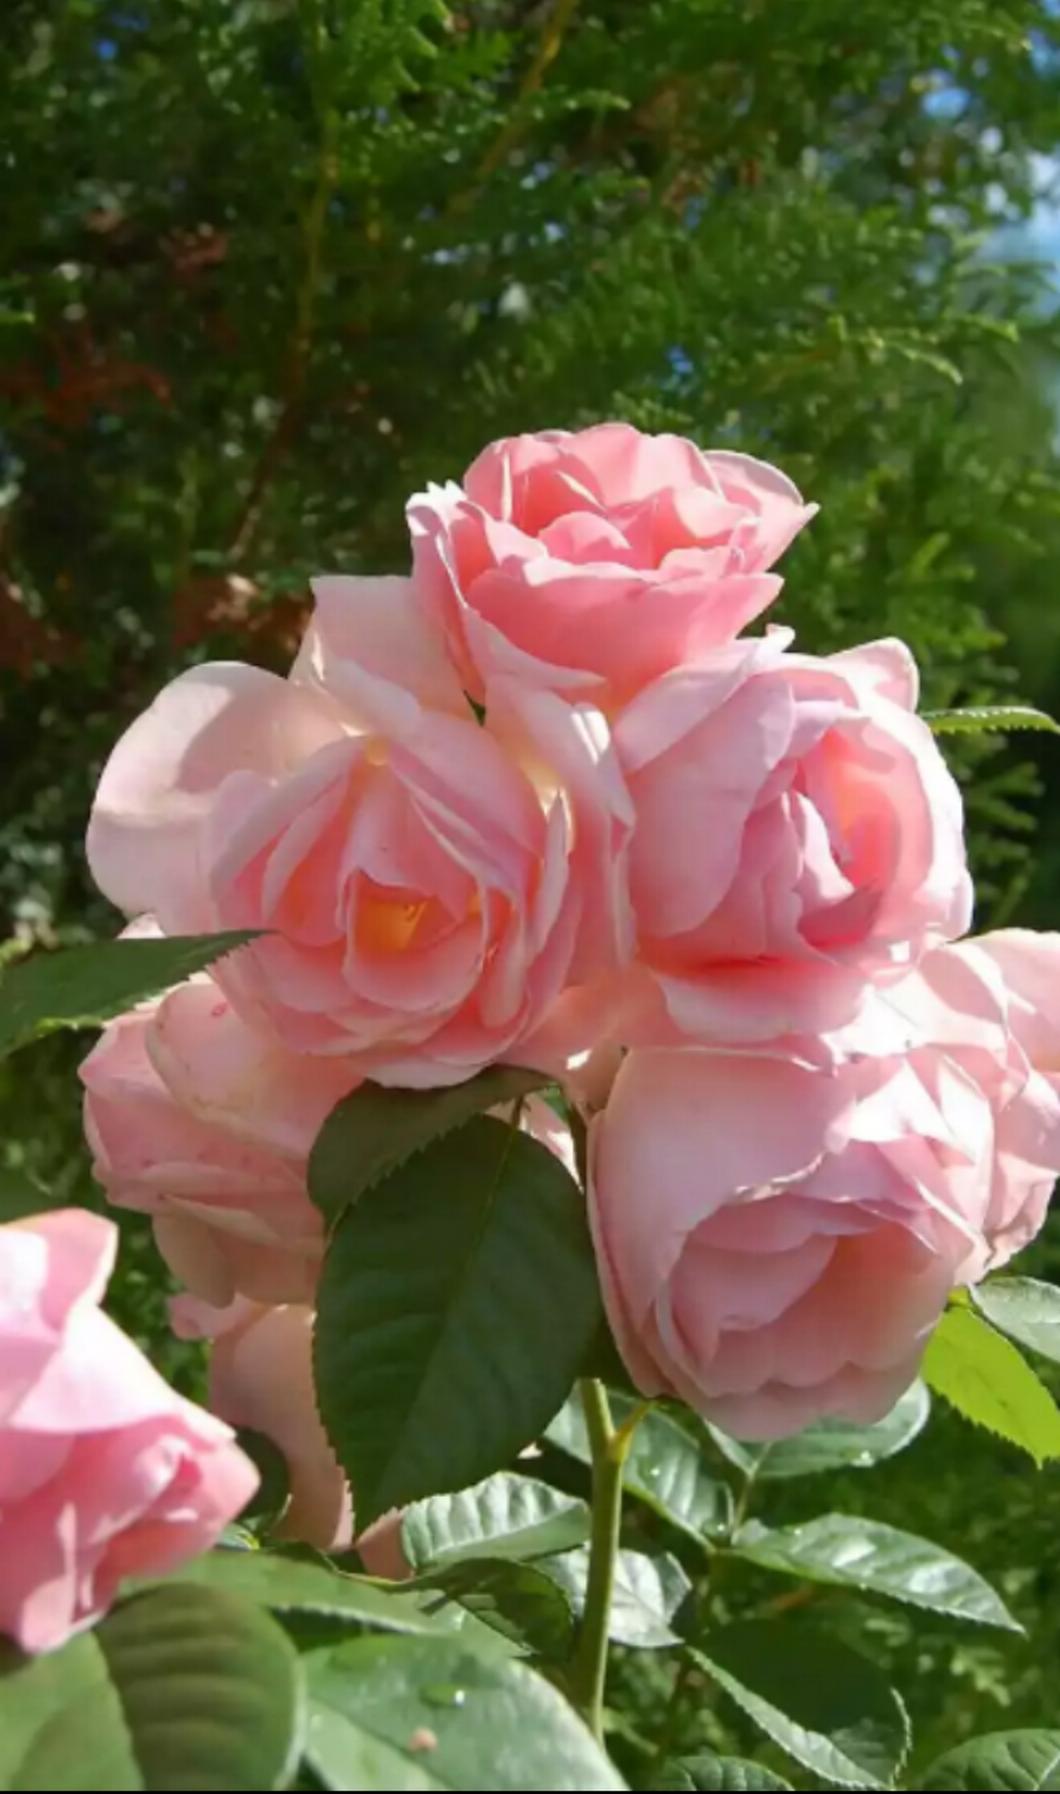 pretty in pink rose pinterest flowers pretty in pink love rose beautiful izmirmasajfo